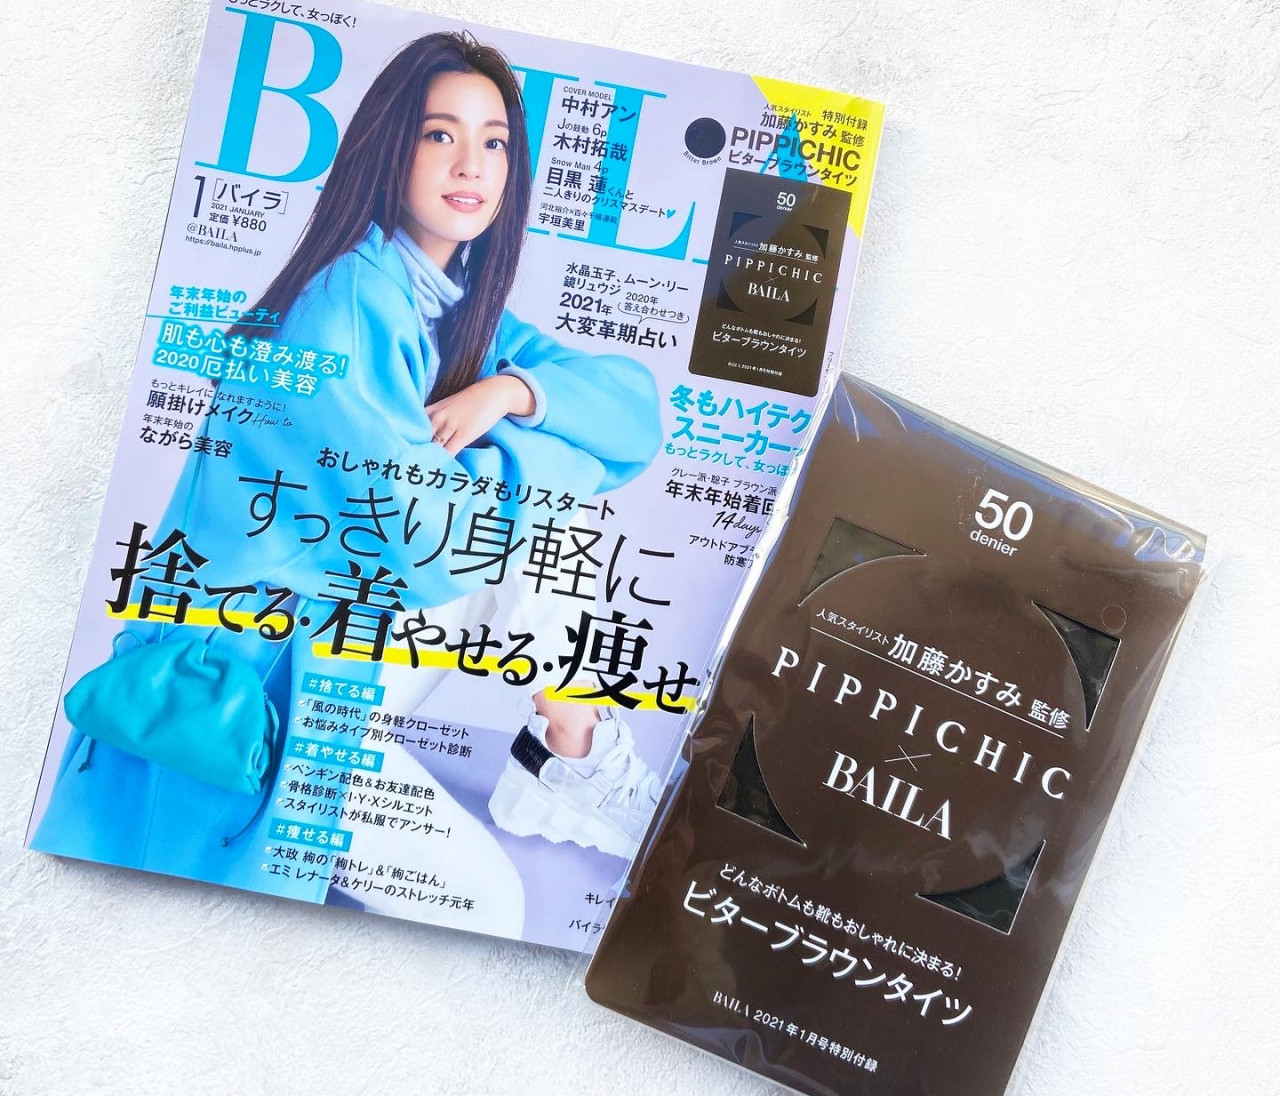 BAILA1月号発売♪今月号の読みどころは?